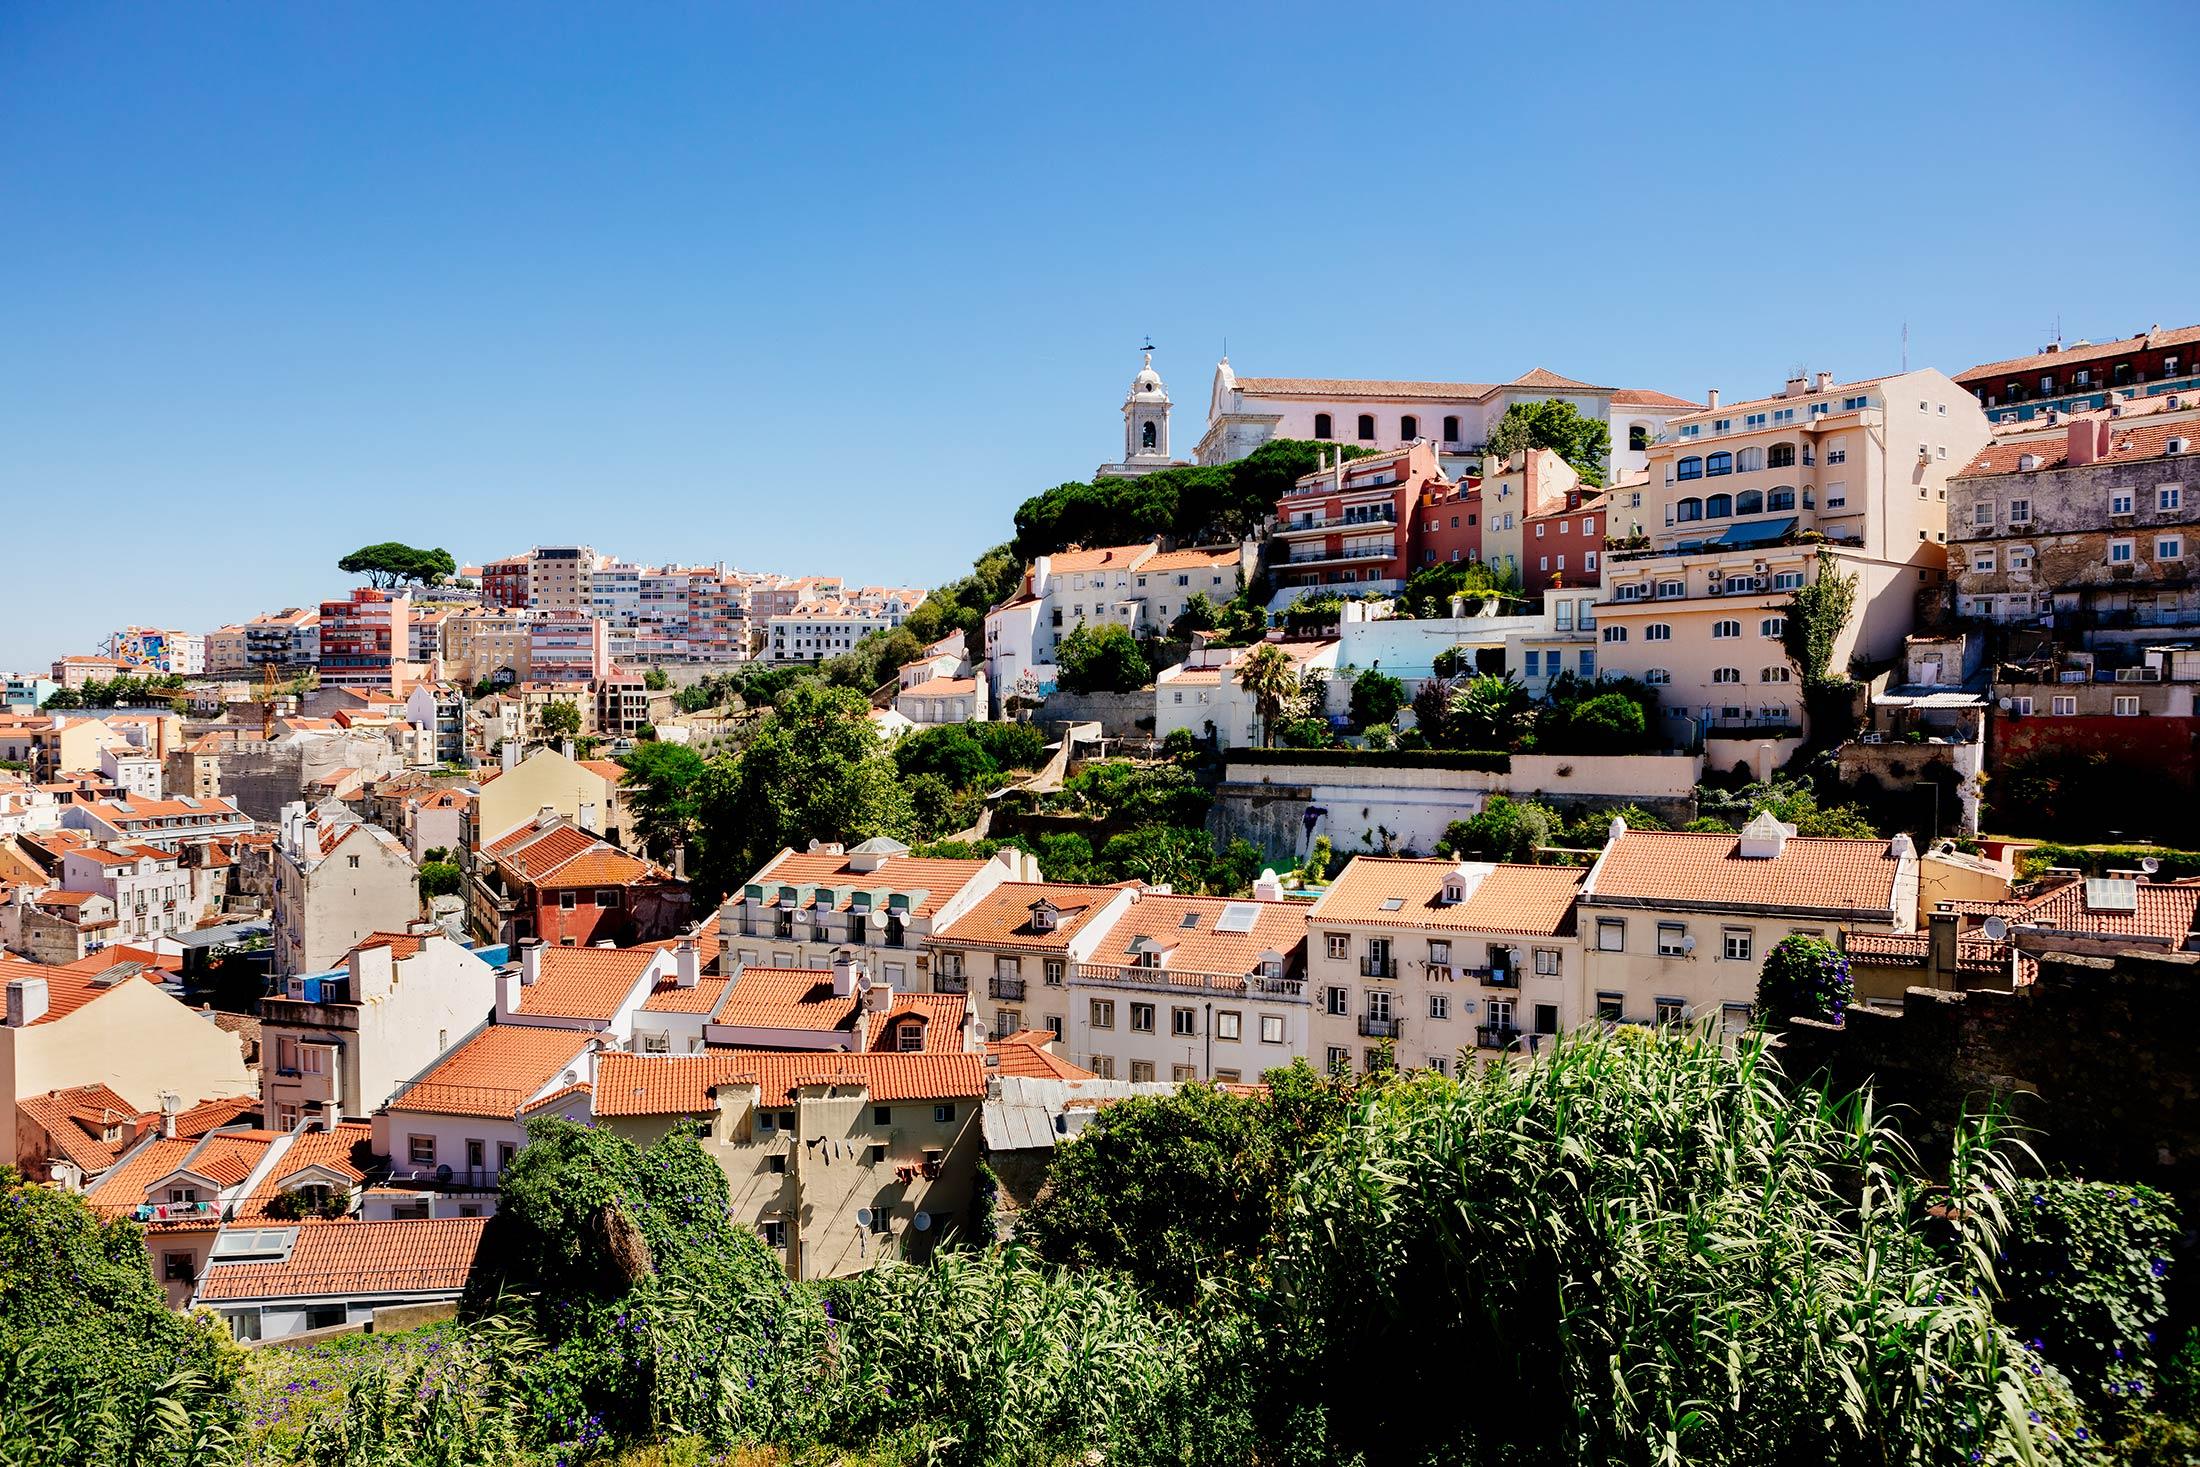 LIS_Lissabon_04-Mitja_Schneehage